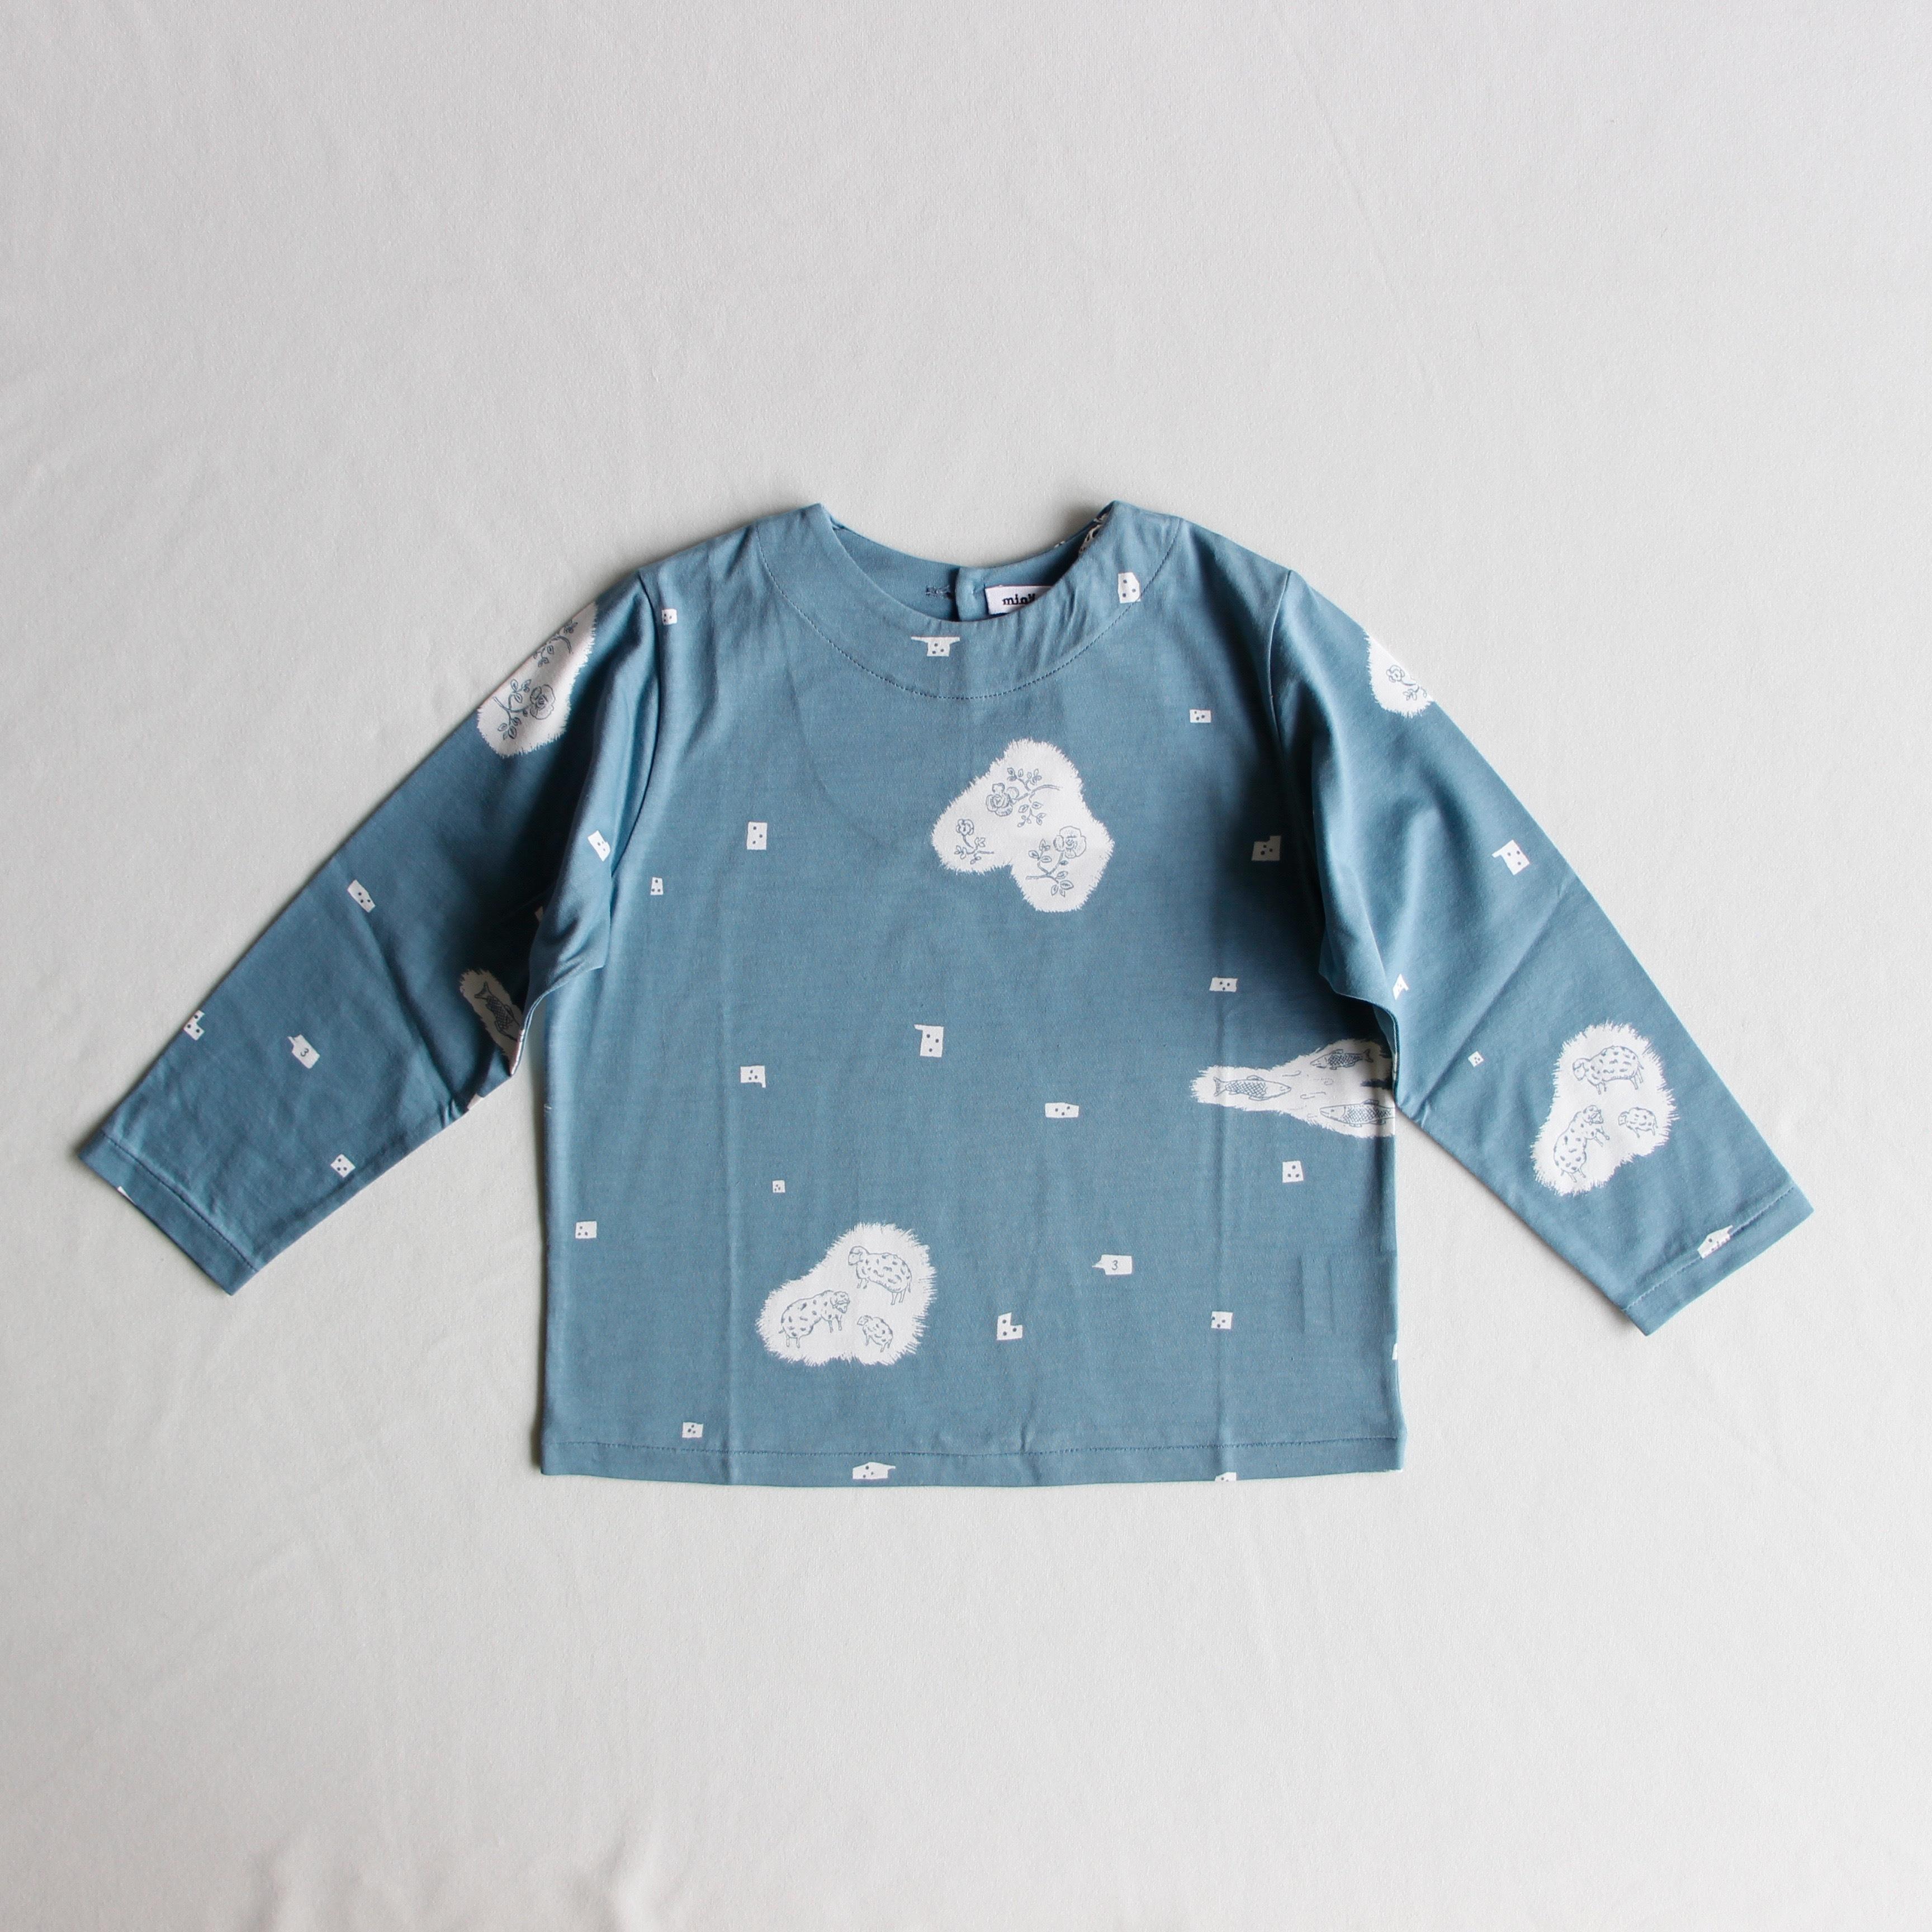 《mina perhonen 2019AW》trois 長袖カットソー / blue / 110-140cm